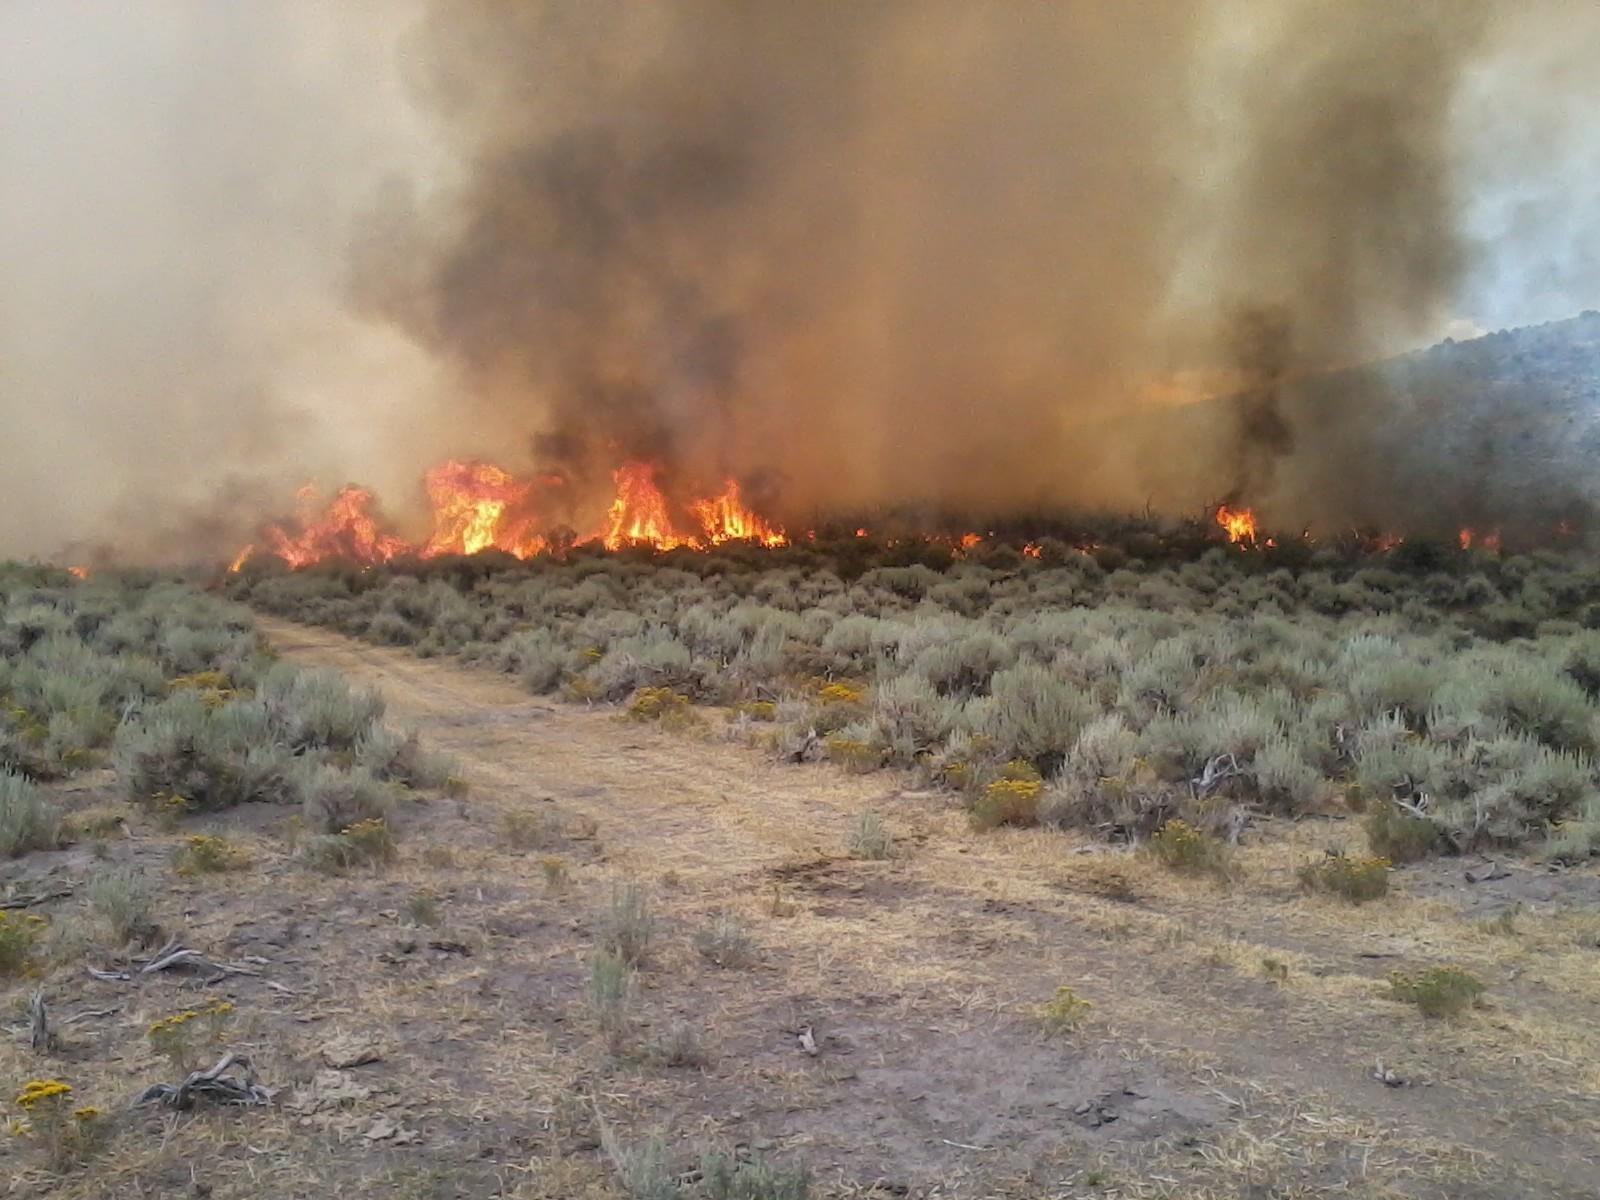 570 acre blazed contained near Eureka